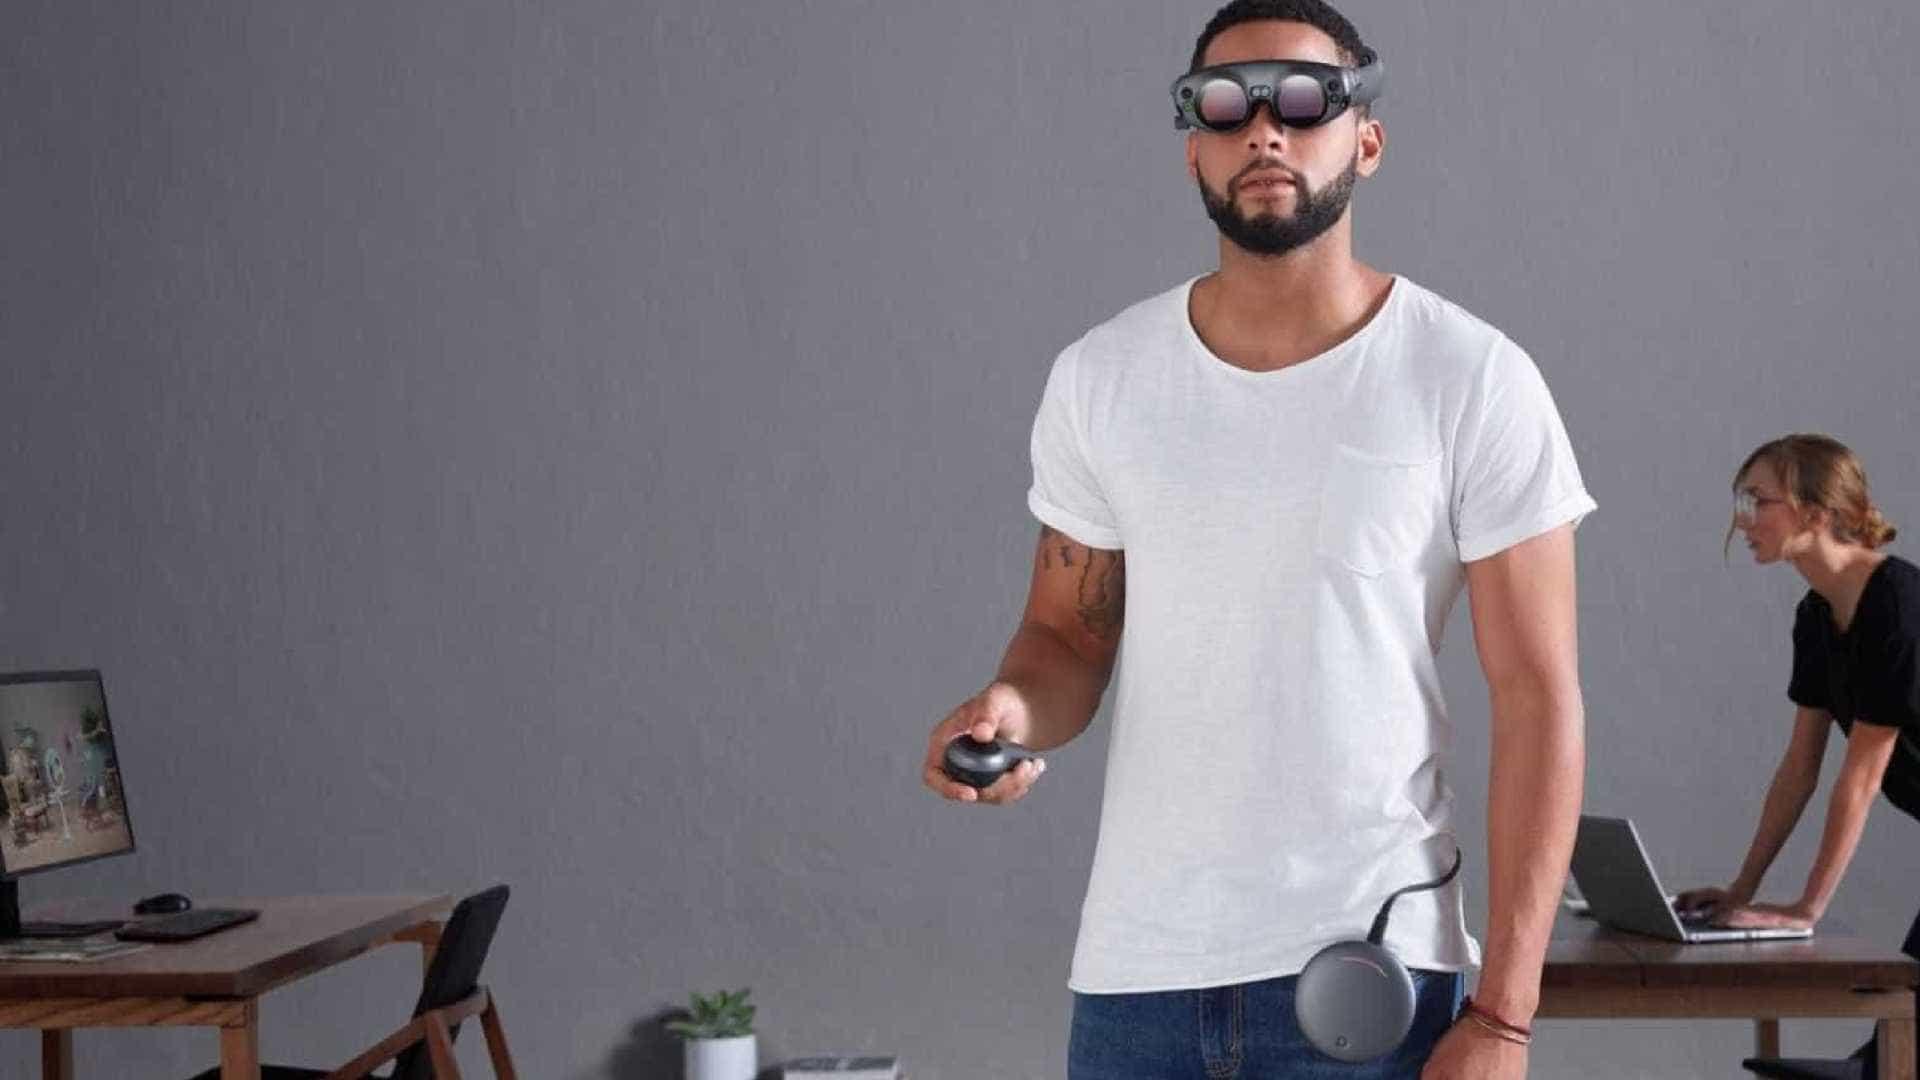 Óculos de realidade aumentada substituirá smartphones, diz empresa